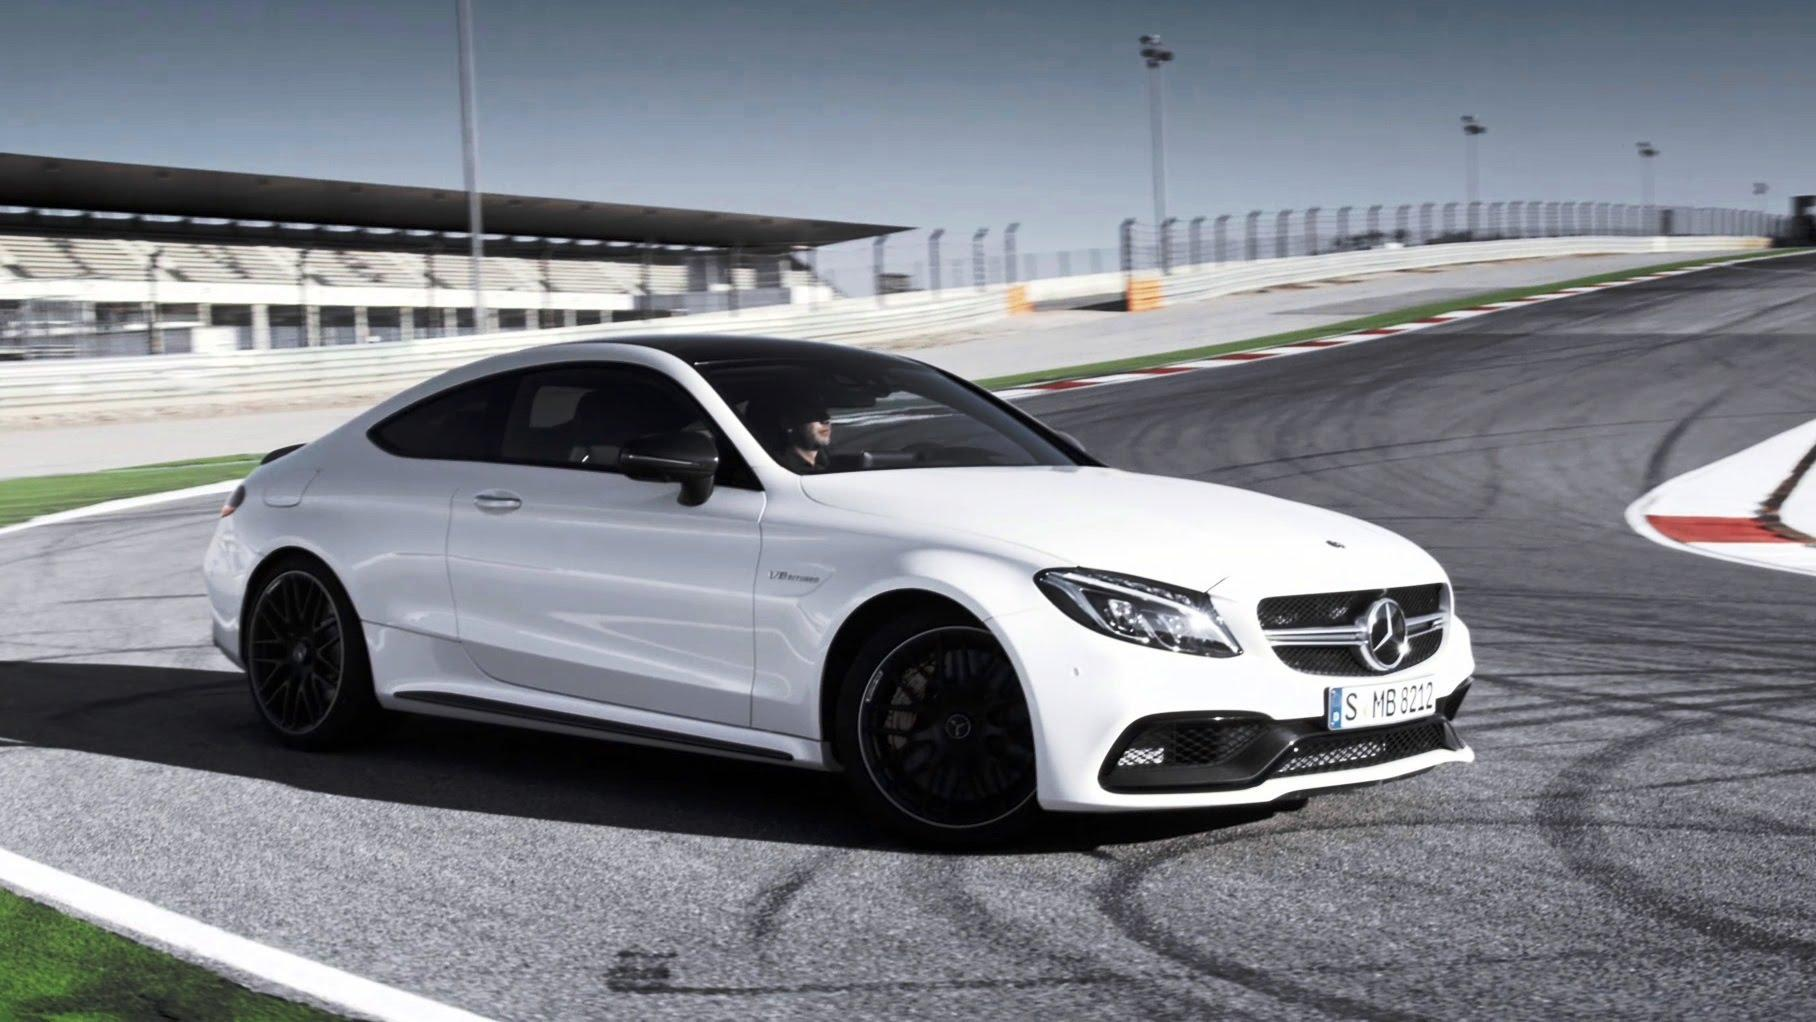 Mercedes C43 Amg Coupe >> Mercedes Benz C 43 Amg Coupe 4matic C205 Laptimes Specs